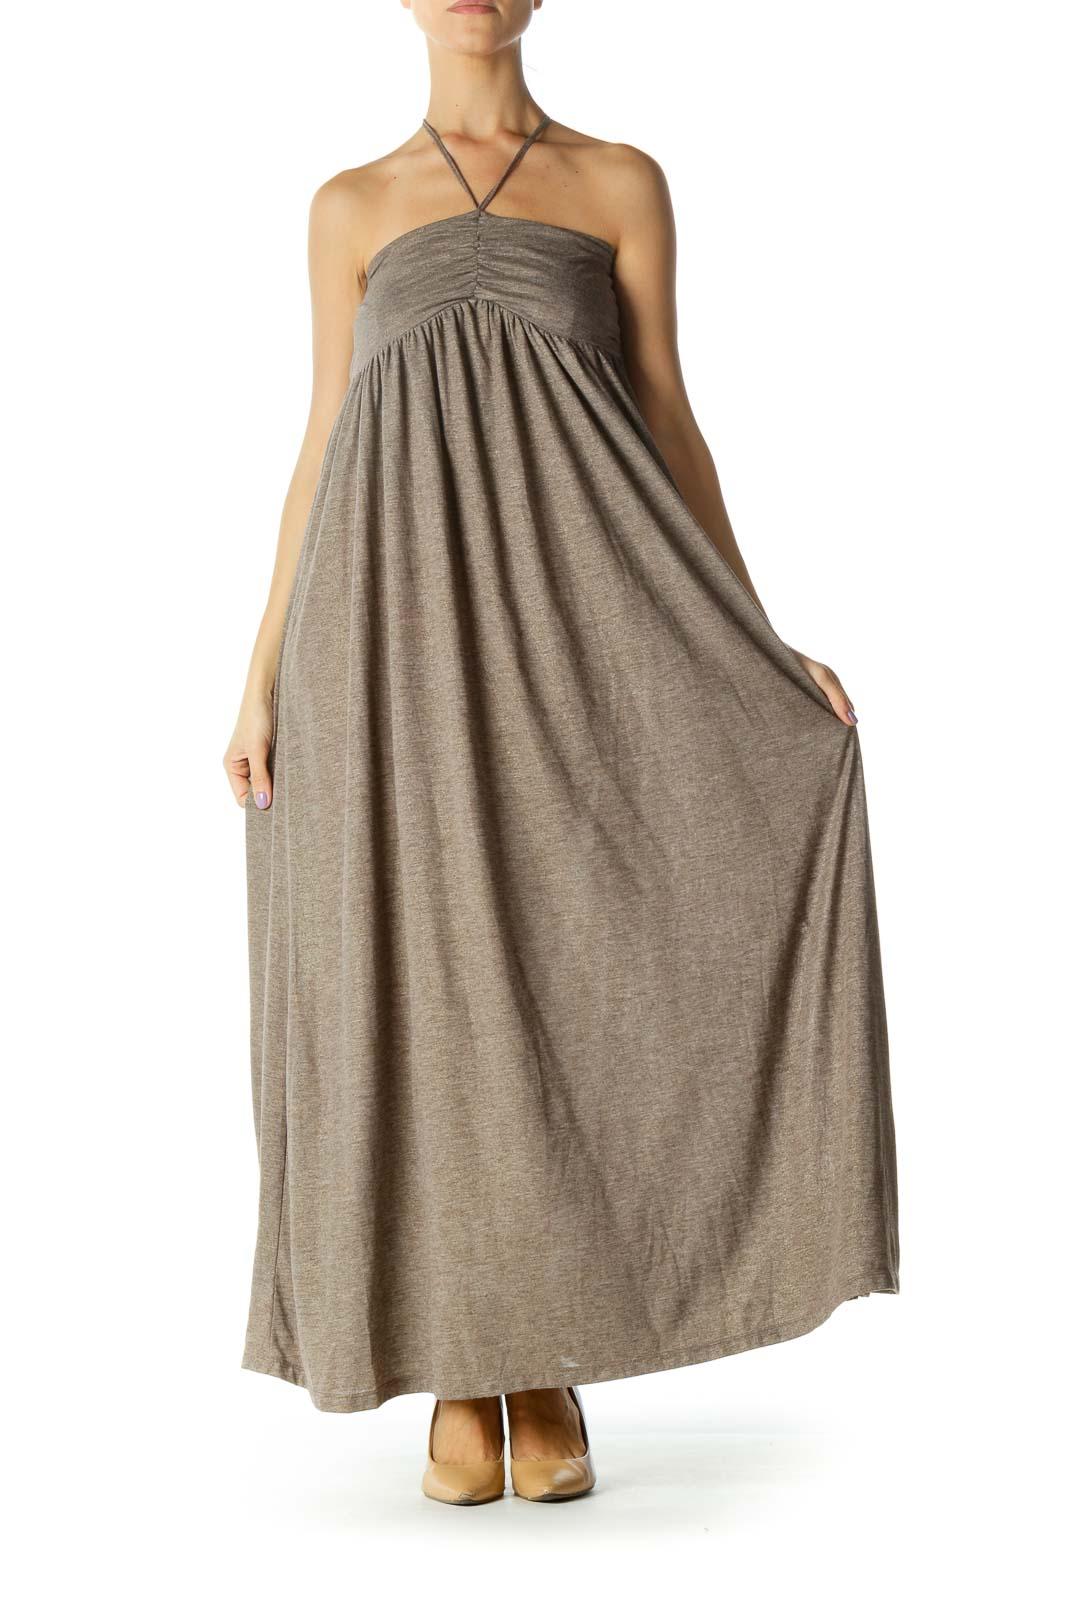 Beige Gold Sparkle Strapless Jersey-Knit Day Dress